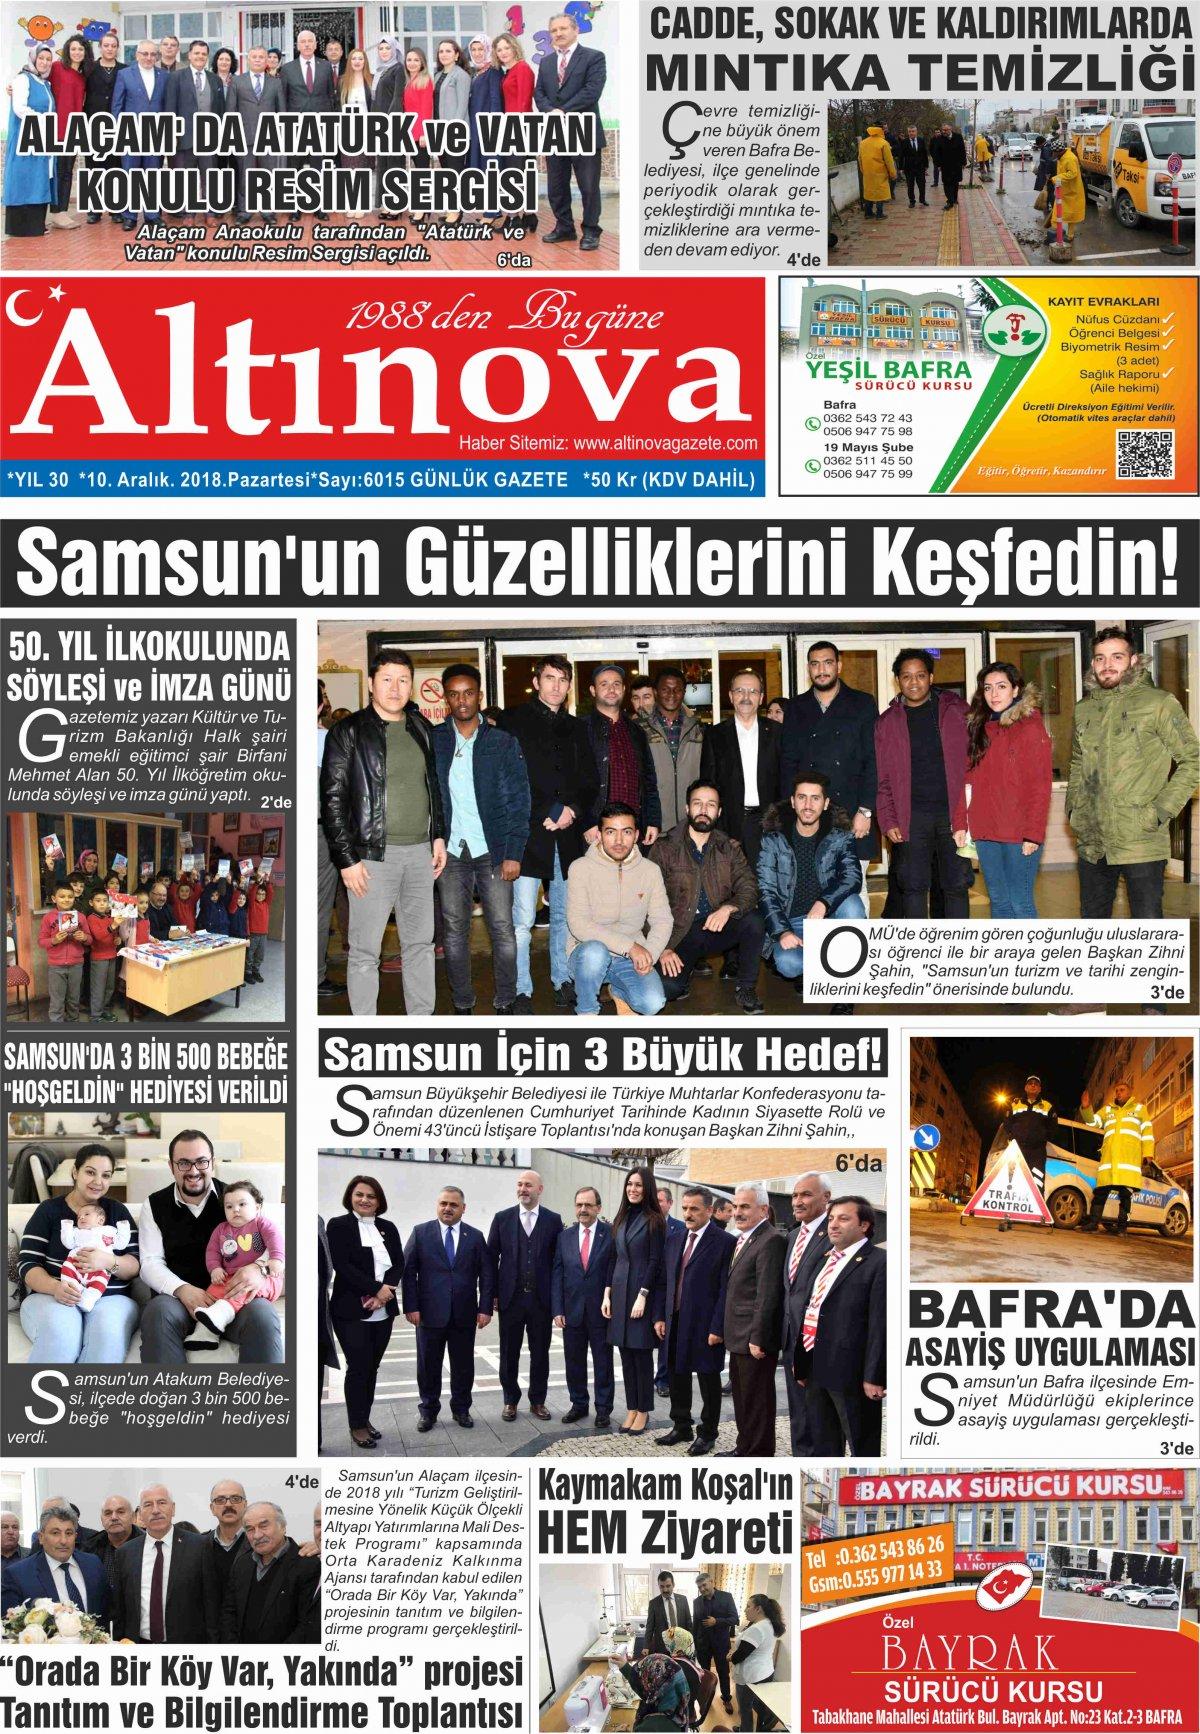 Bafra Haberleri | Bafra Haber – Bafra Son Dakika Haber - 10.12.2018 Manşeti